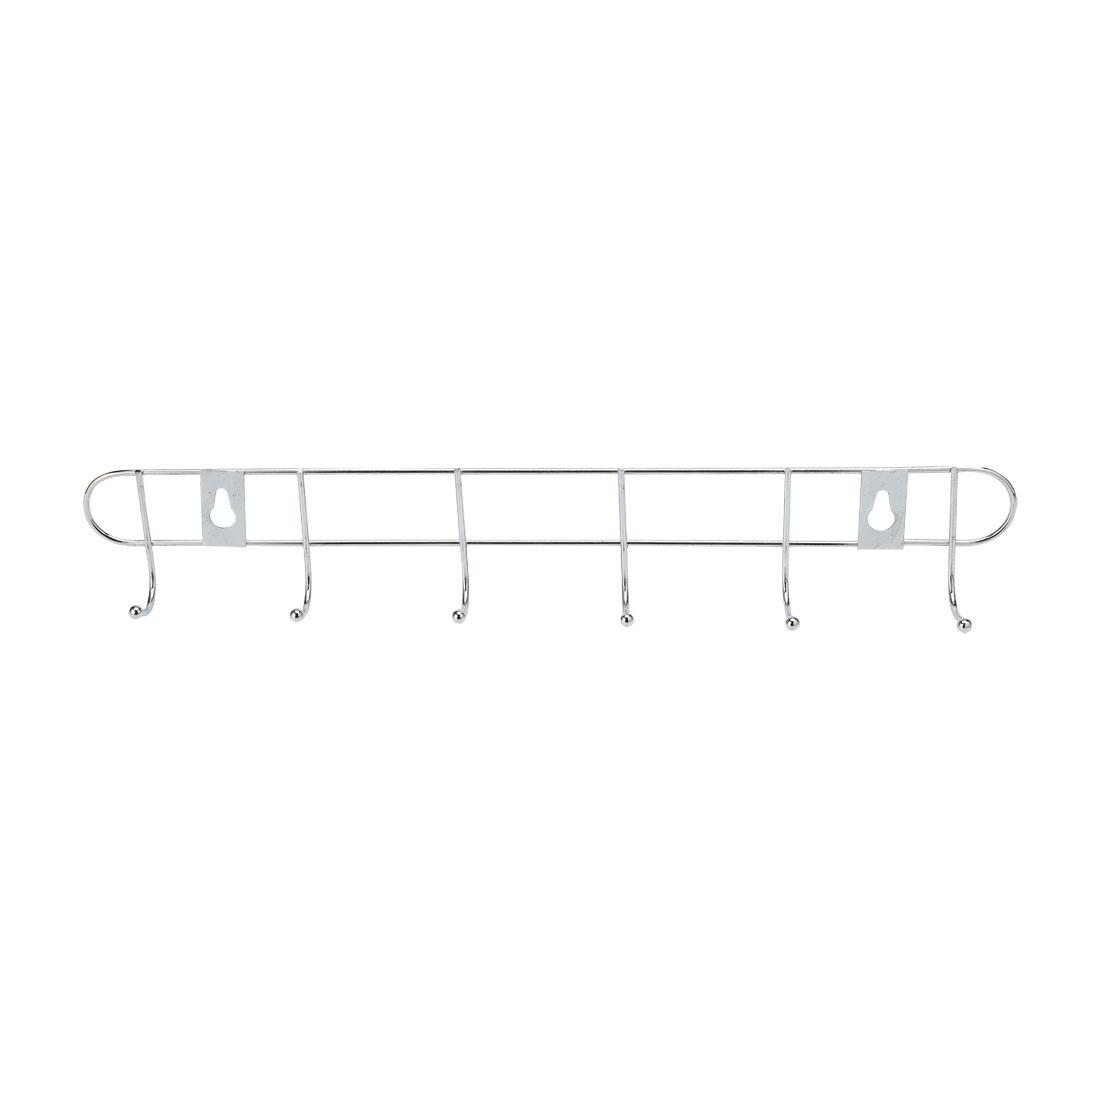 Bathroom Metal 6 Hooks Towel Coat Hanger Wall Rack Silver Tone